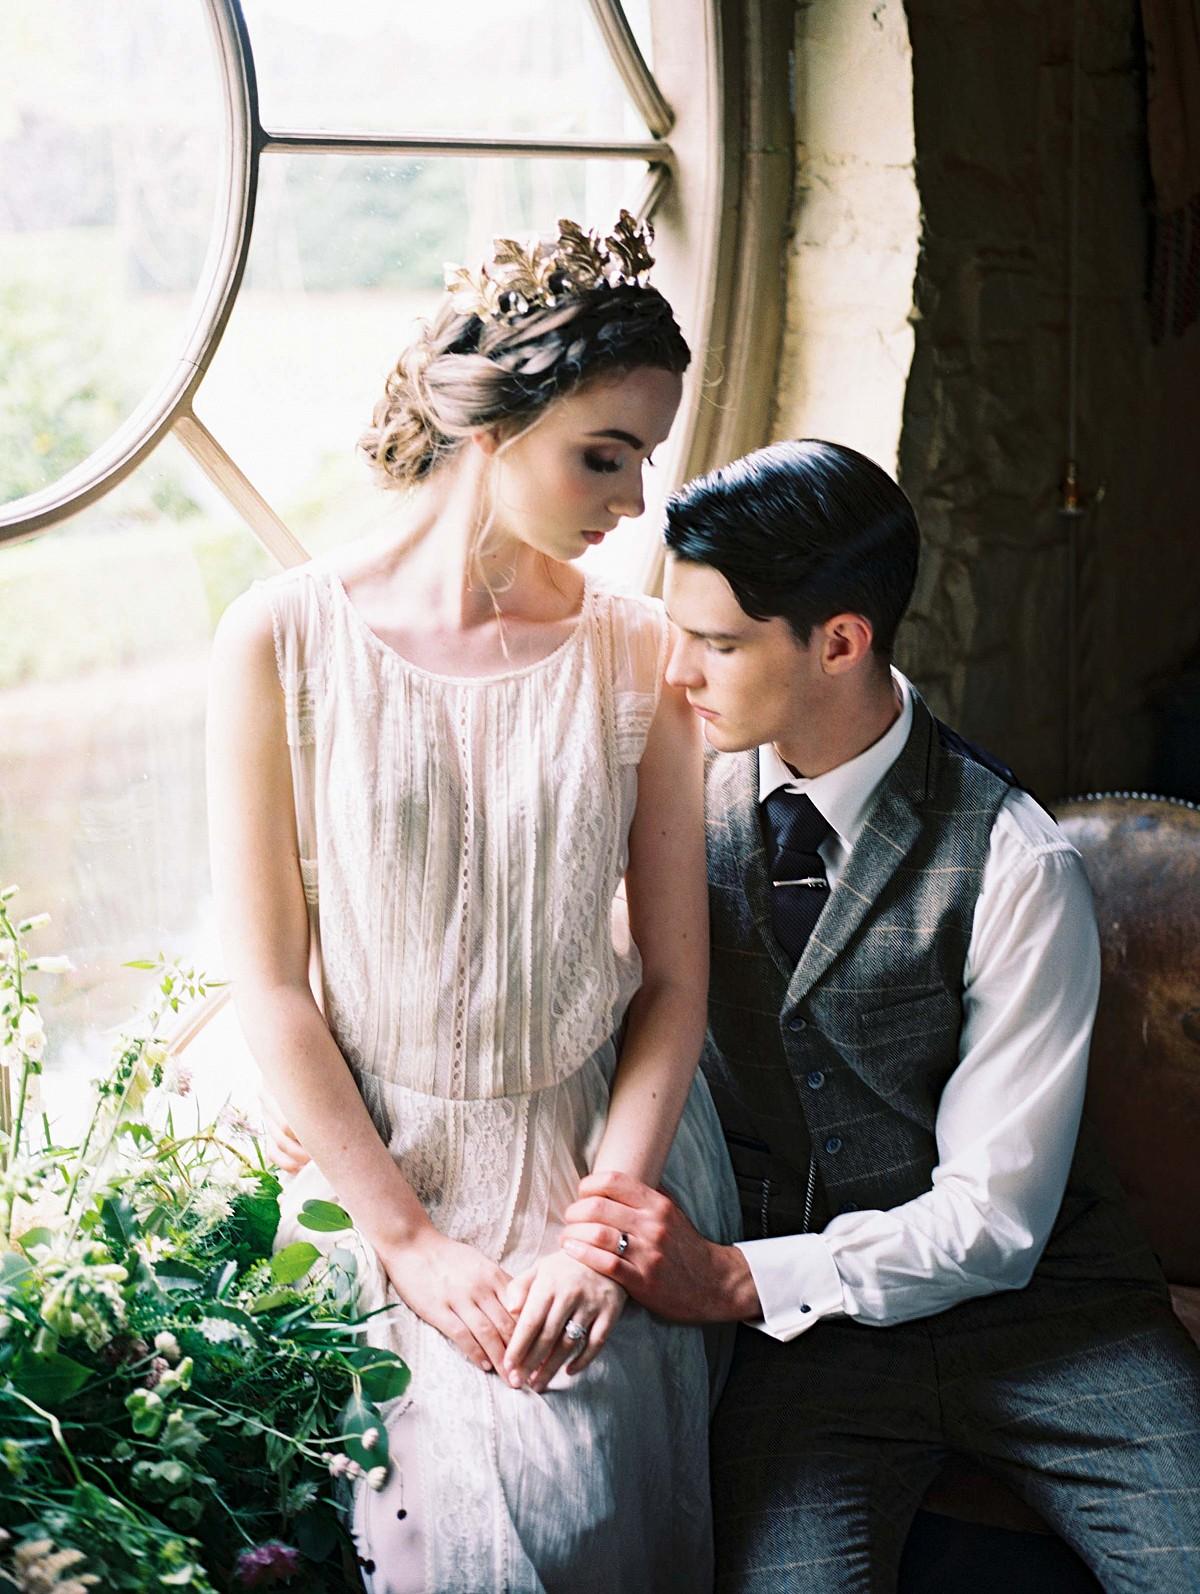 Nostalgic Irish Wedding in Earthy Green tones